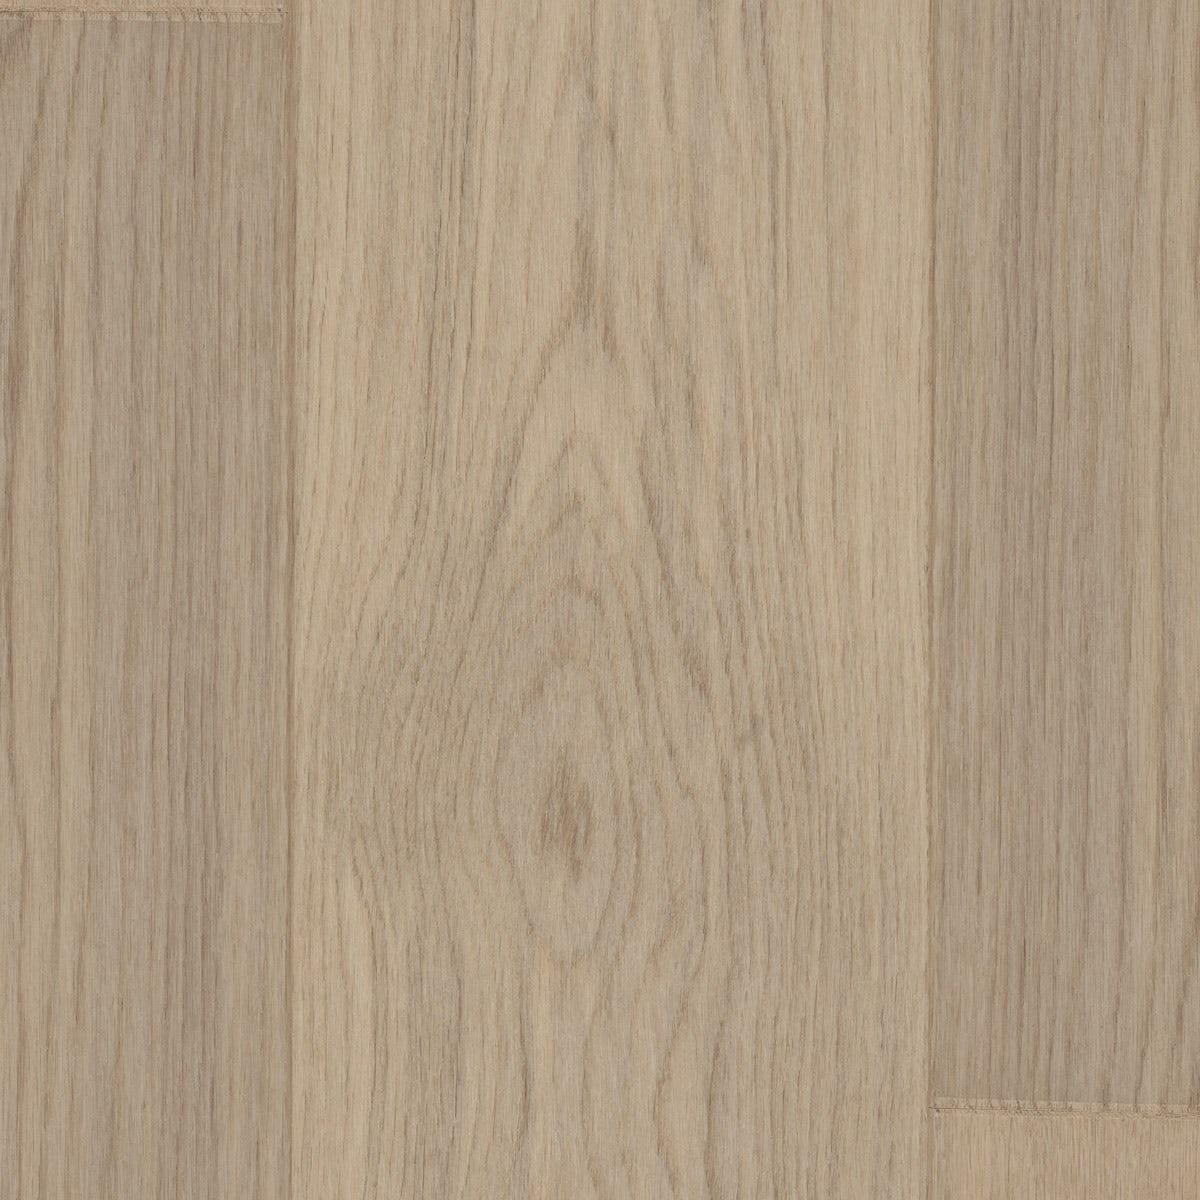 Tuscan Strato Warm Grey Washed Oak 3 Ply Brushed